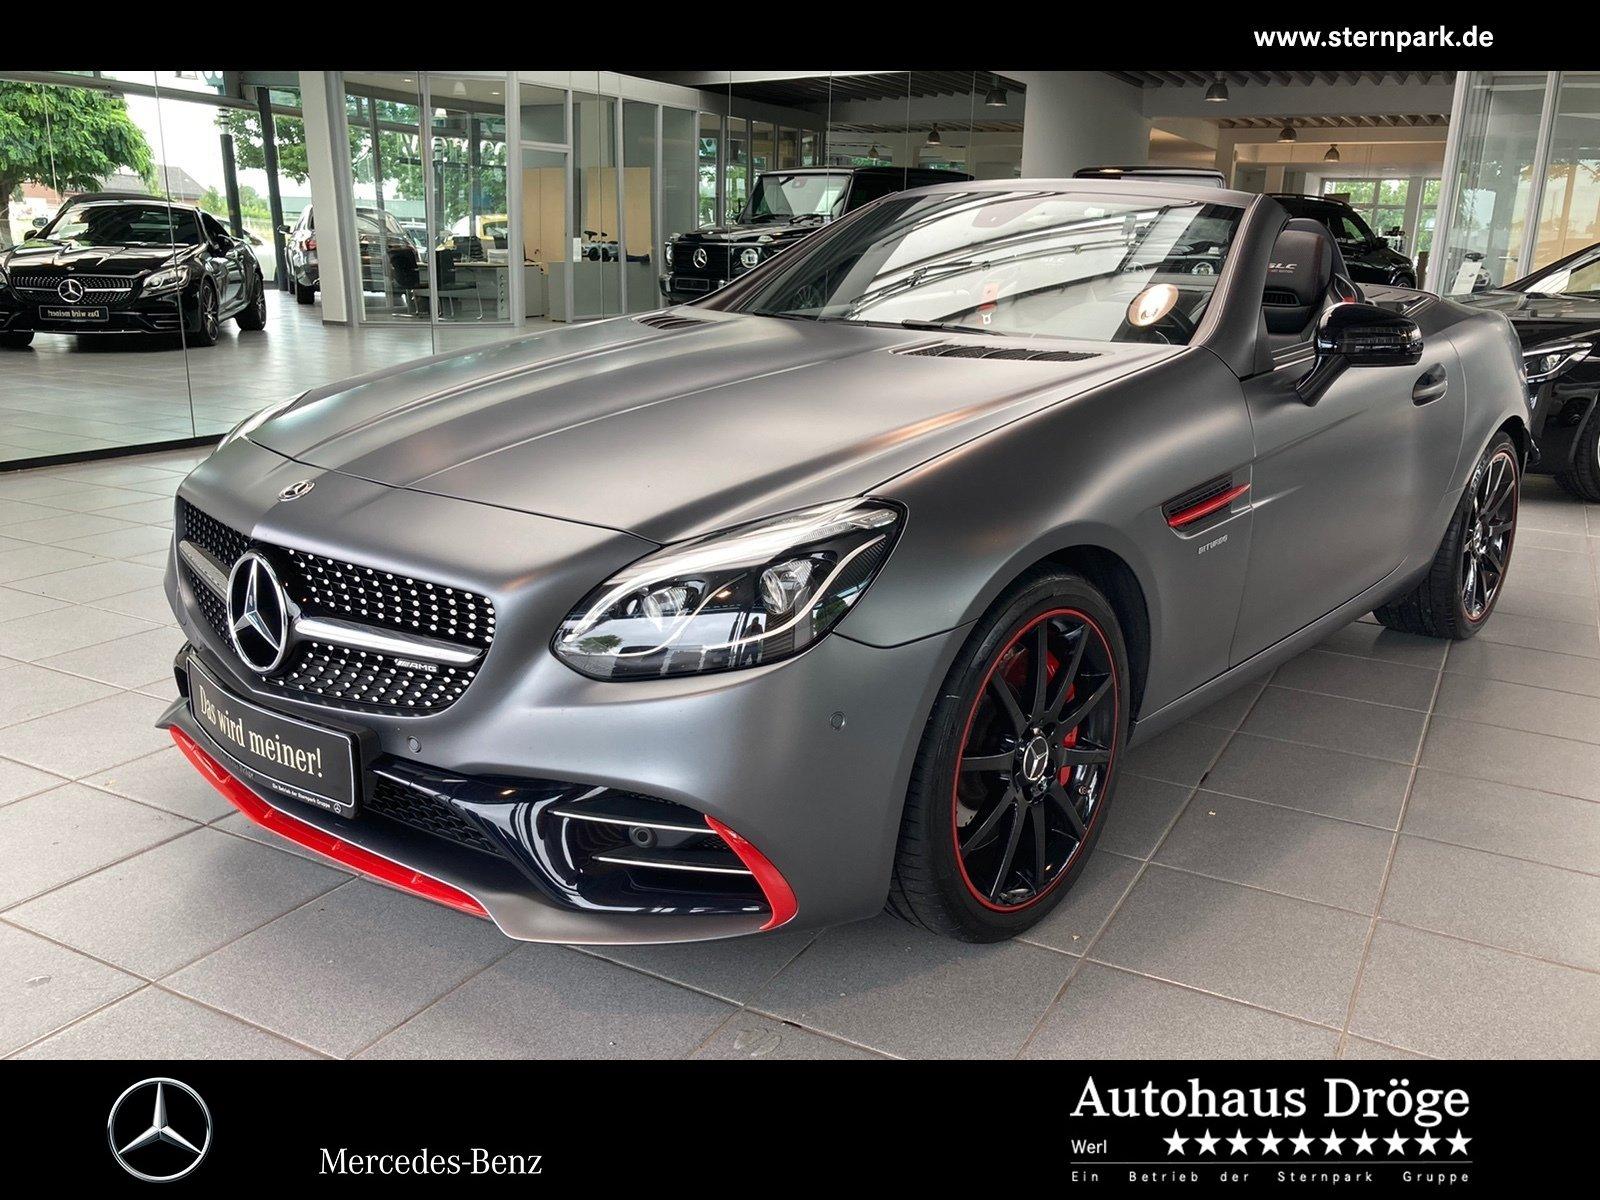 Mercedes-Benz SLC 43 AMG RedArt Edition Pano*Kamera*Leder*Navi, Jahr 2017, Benzin